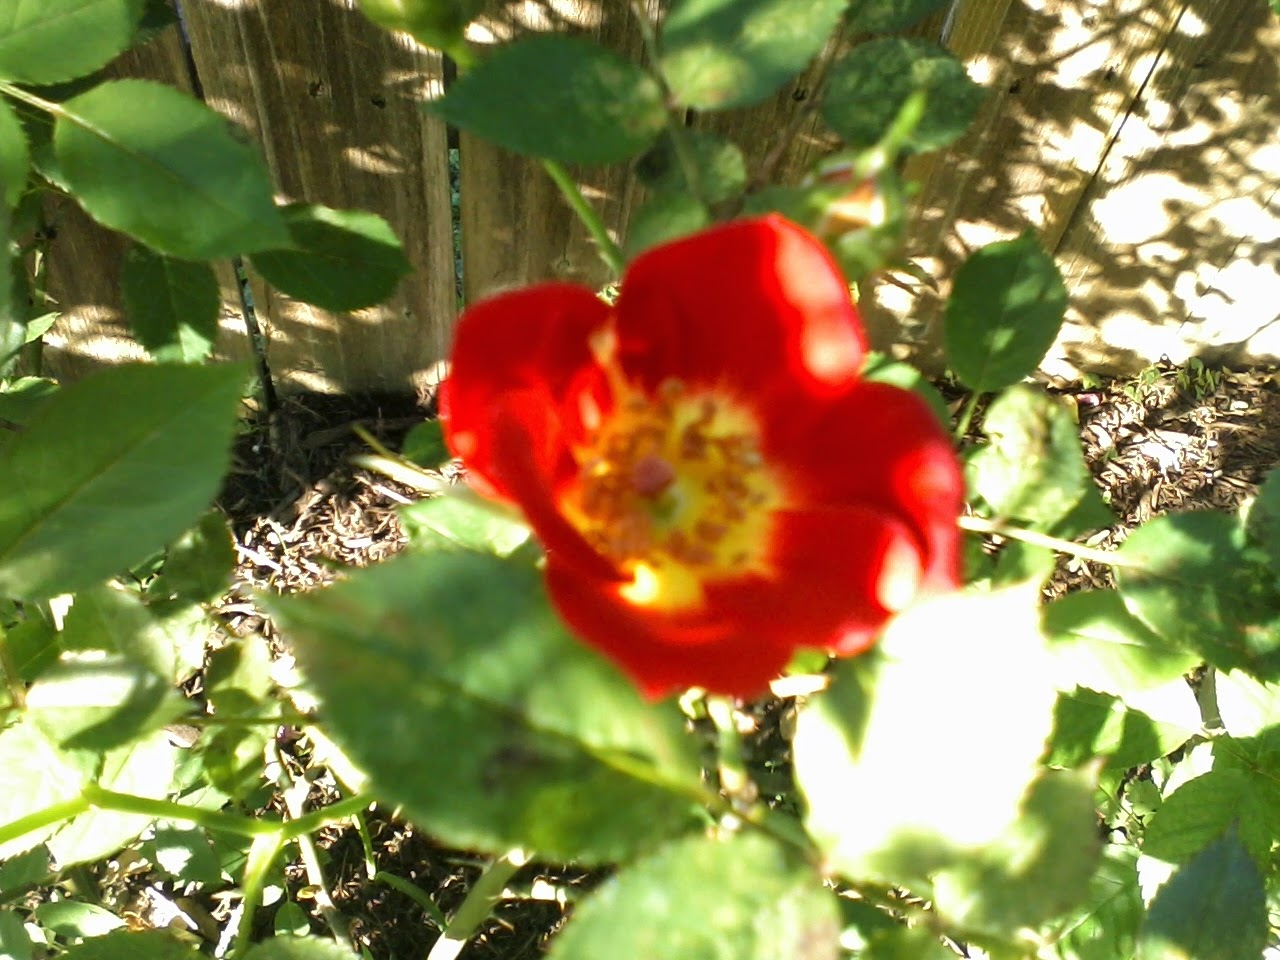 Gardening 2014 - 0409175505.jpg